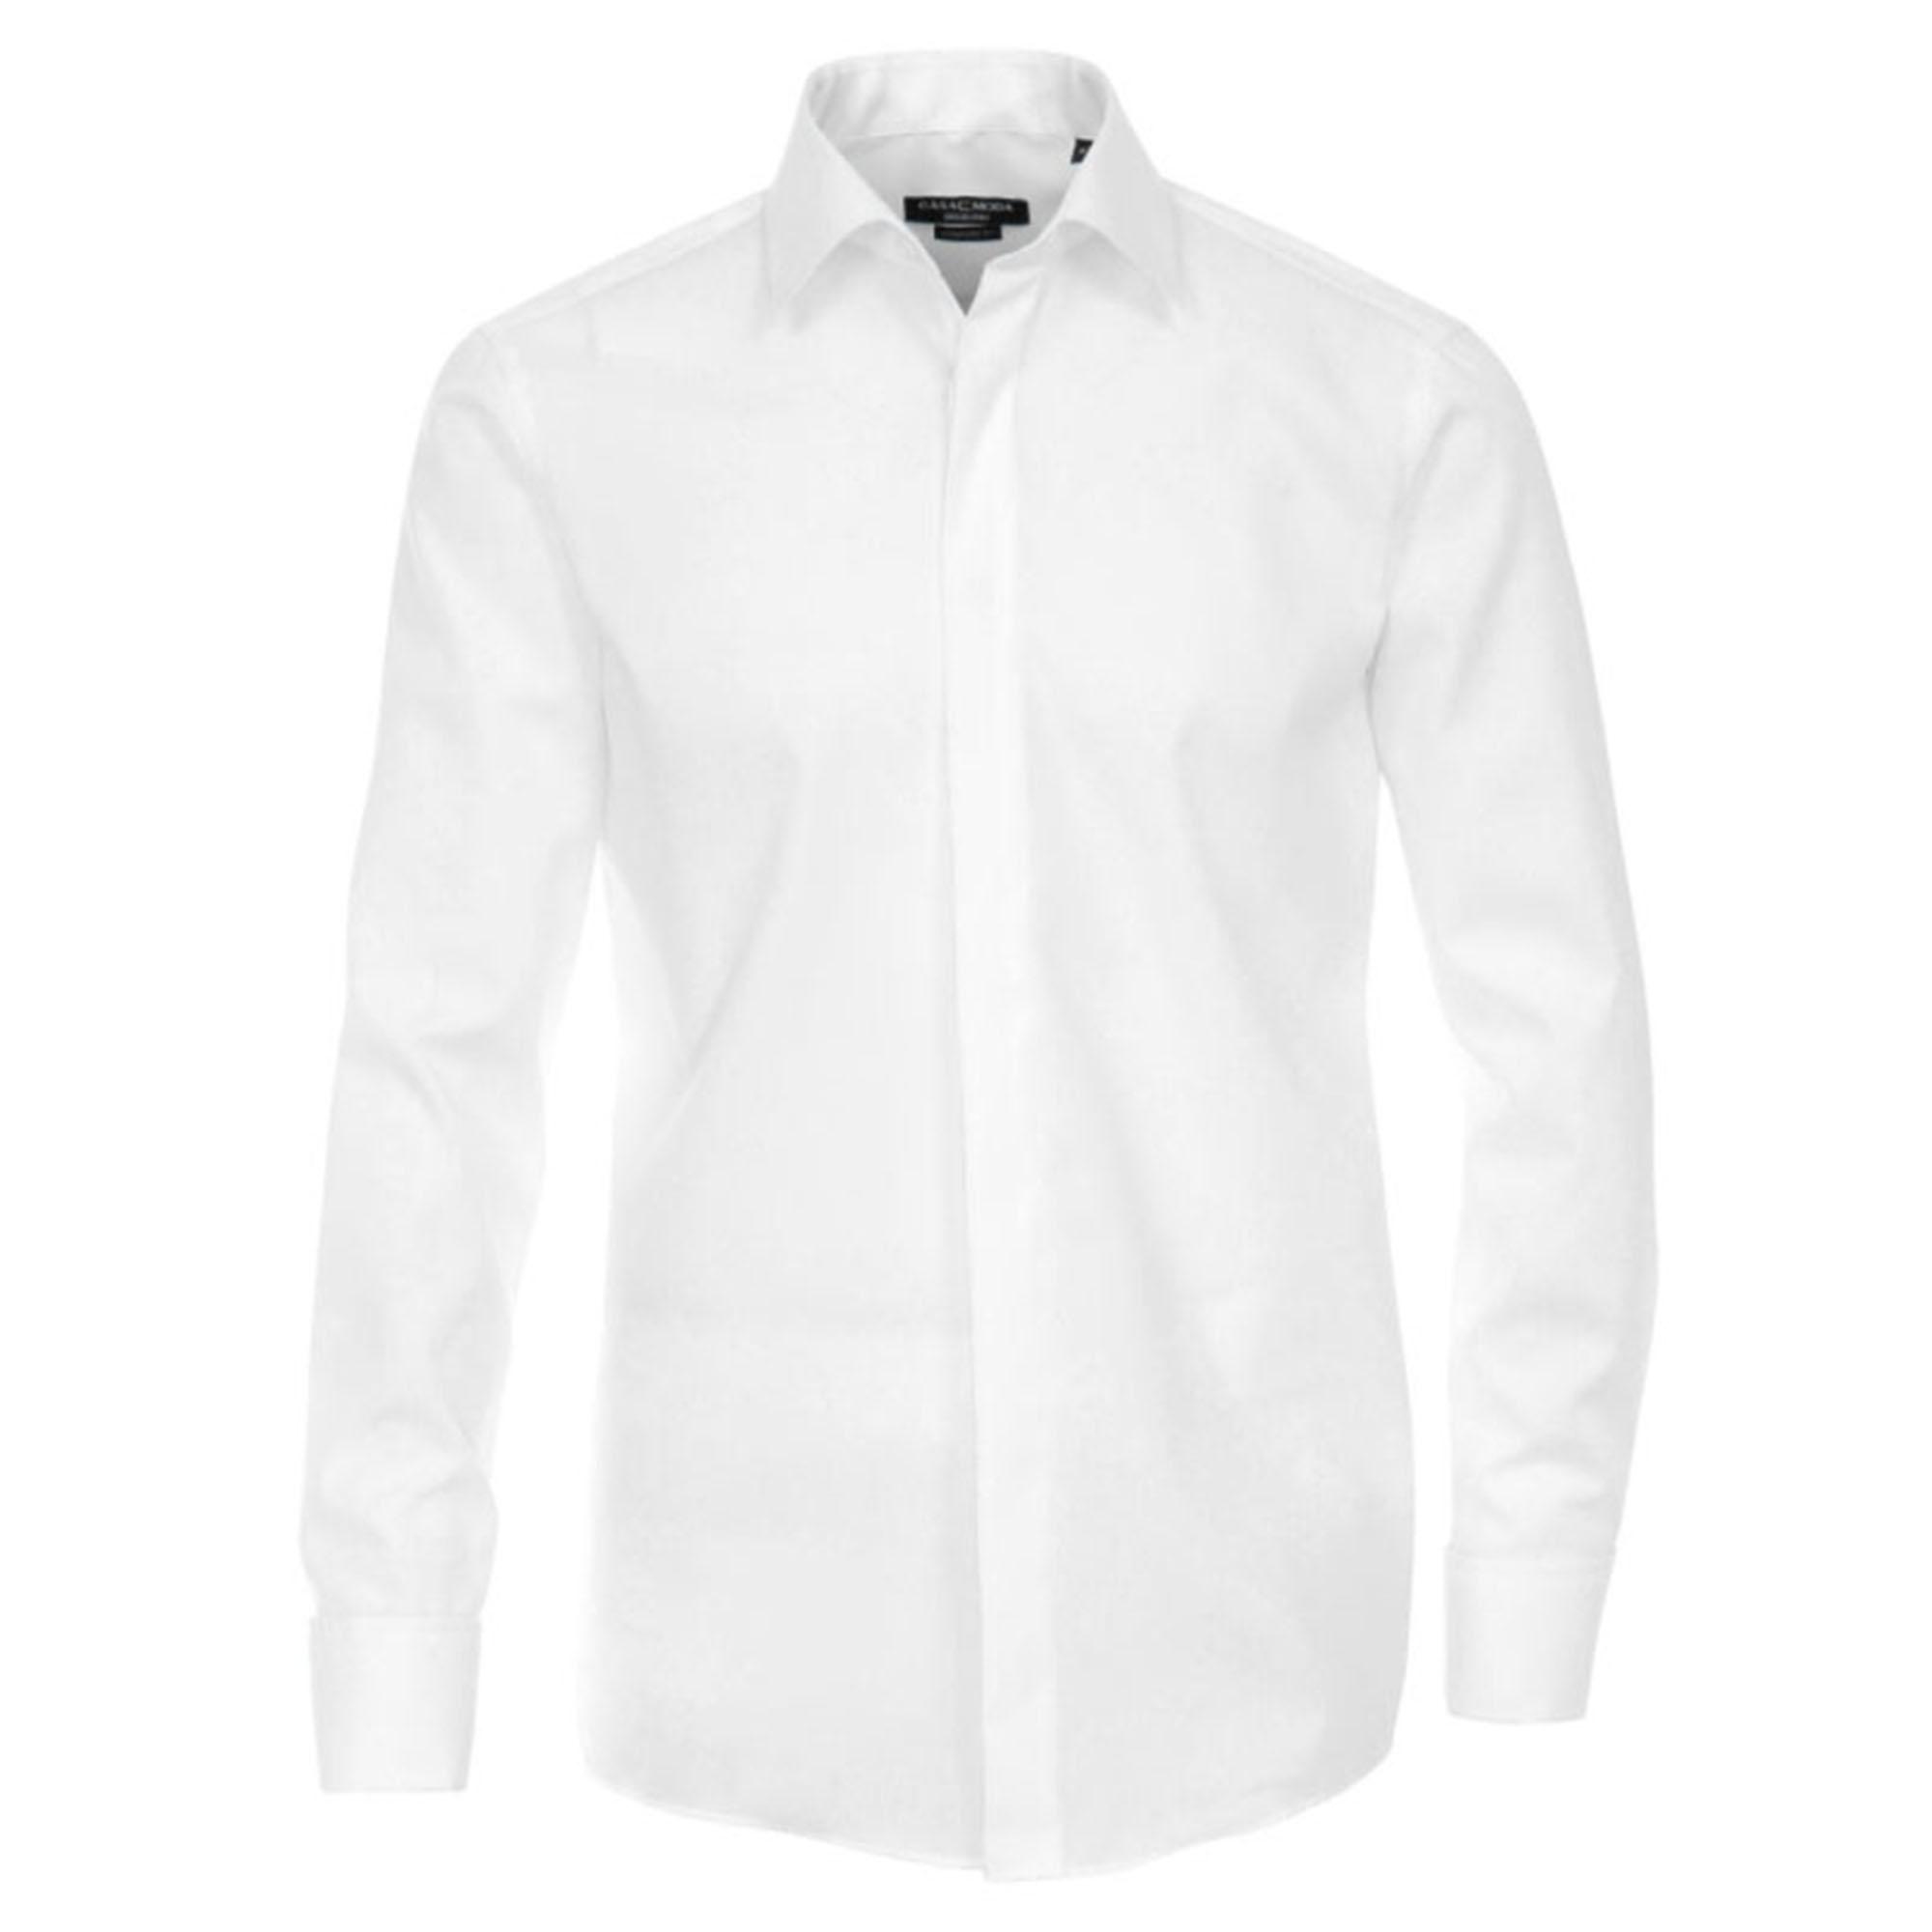 eae09713bce Casa Moda shirt HL8 white kent collar - Paul Malone Shop